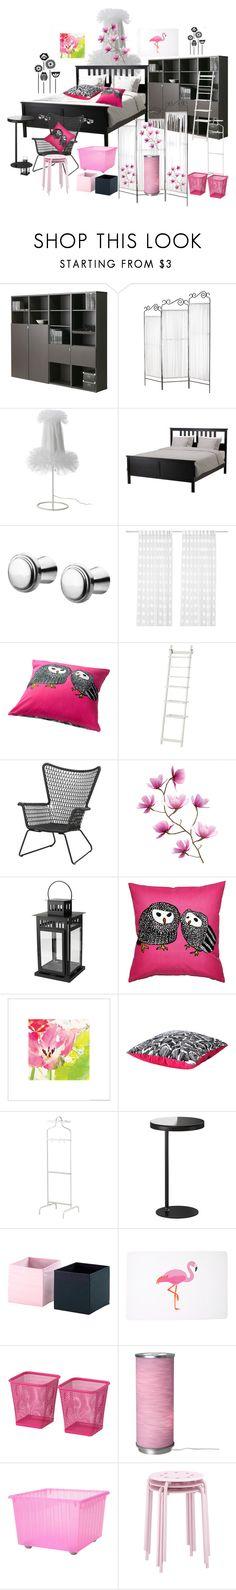 IKEA by ragnhild-bergan on Polyvore featuring interior, interiors, interior design, home, home decor, interior decorating and Black Poppy